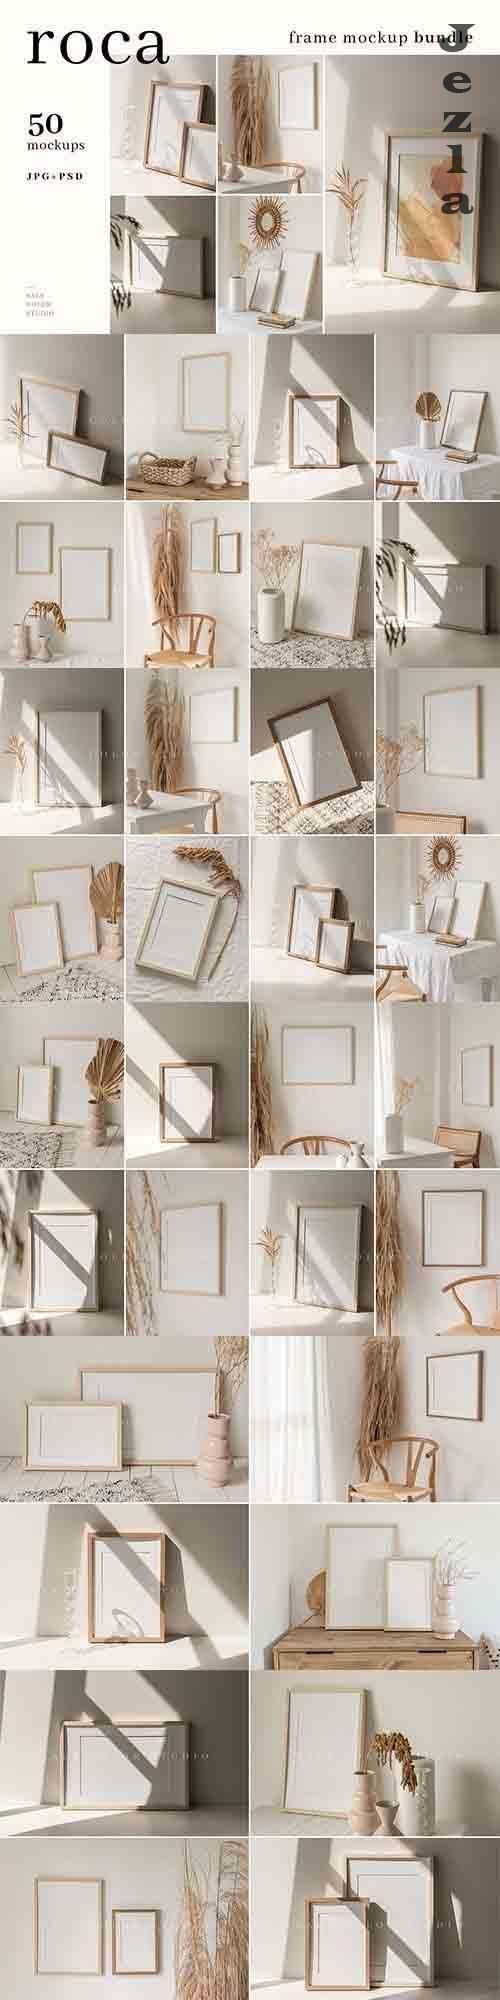 CreativeMarket - Roca Frame Mockup Bundle - JPG + PSD 5954280